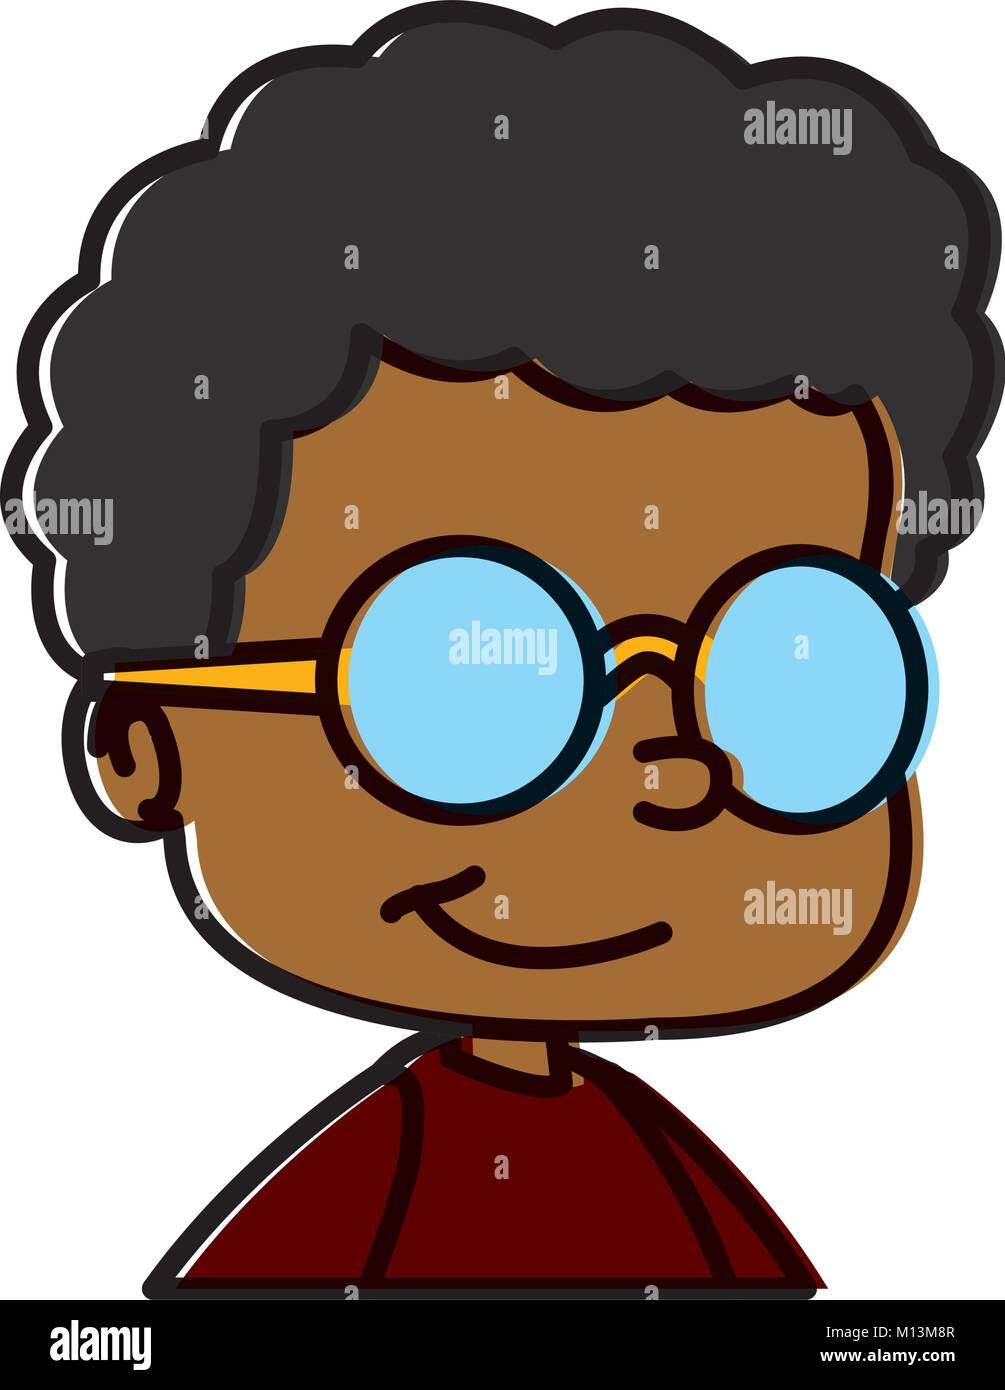 School Boy With Glasses Cartoon Stock Vector Image Art Alamy